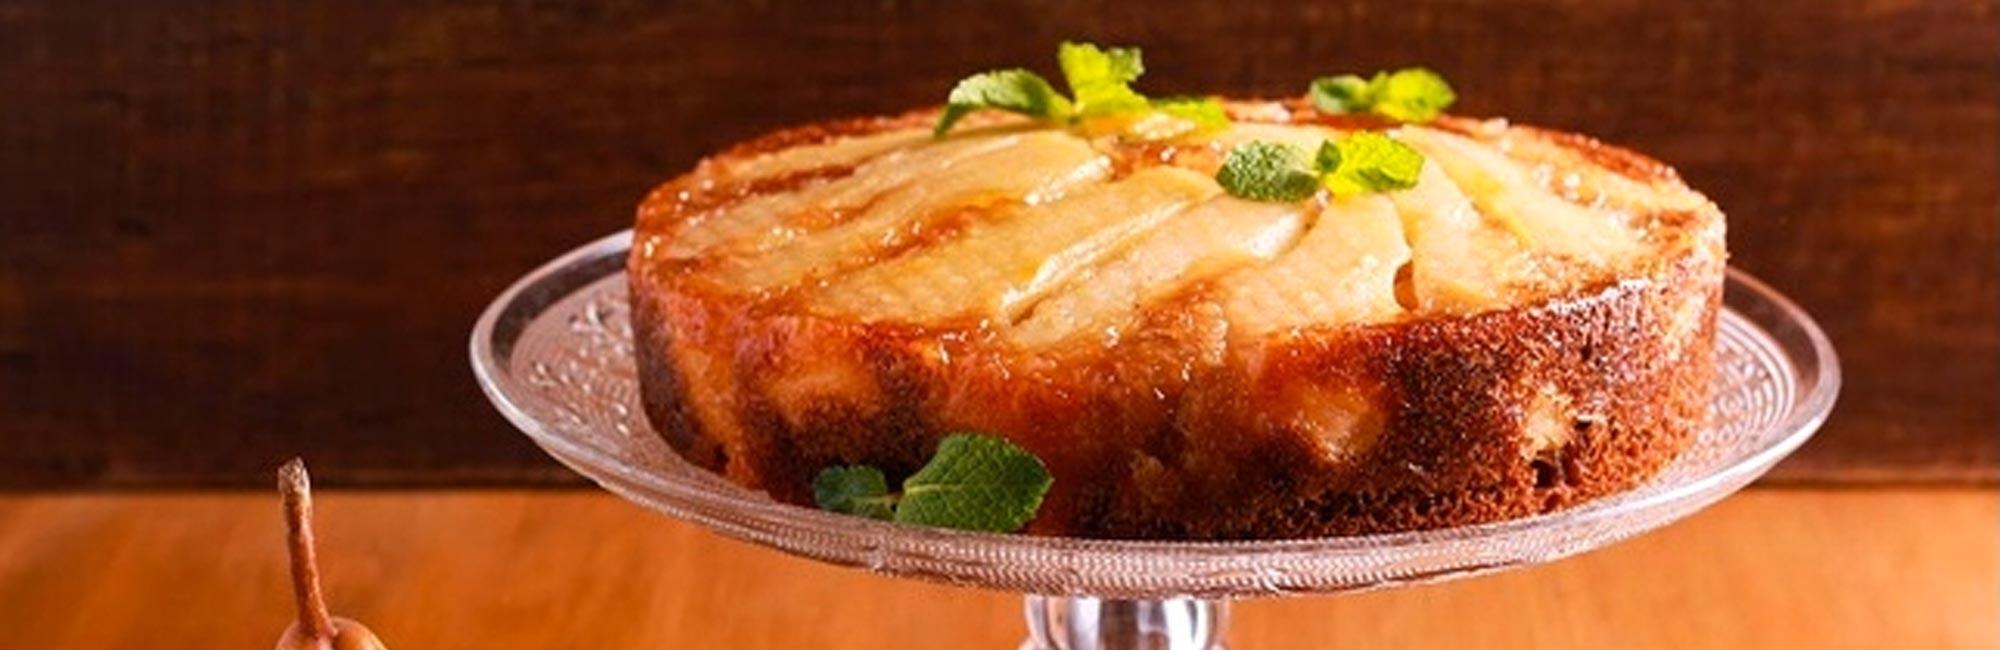 Upside down Pear and Polenta cake